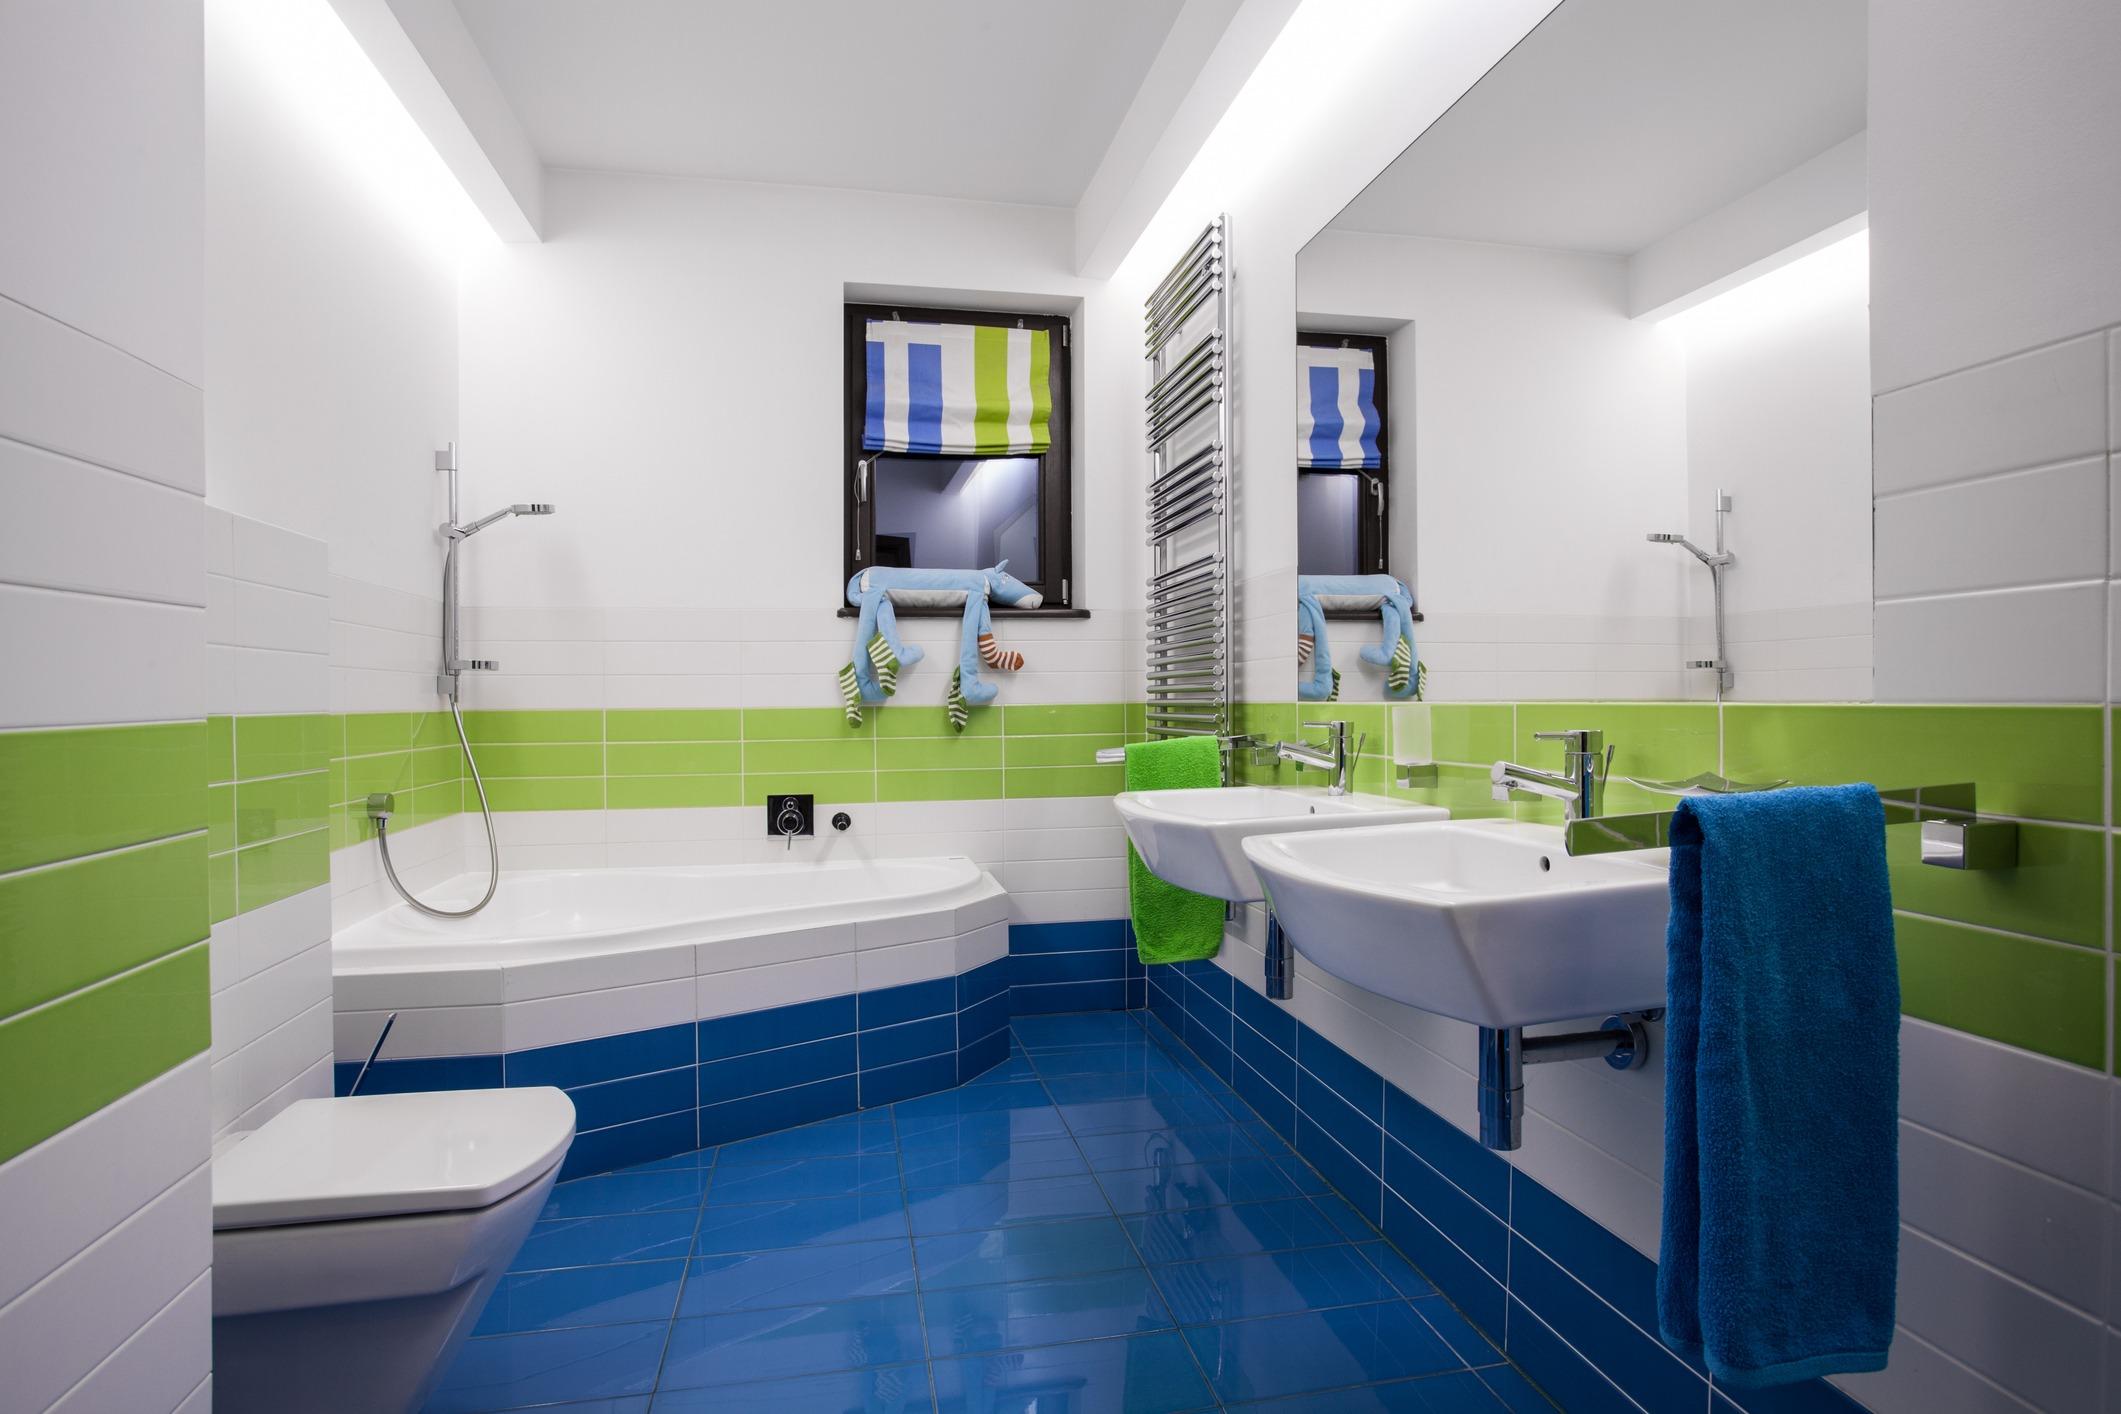 Modern colorful bathroom interior